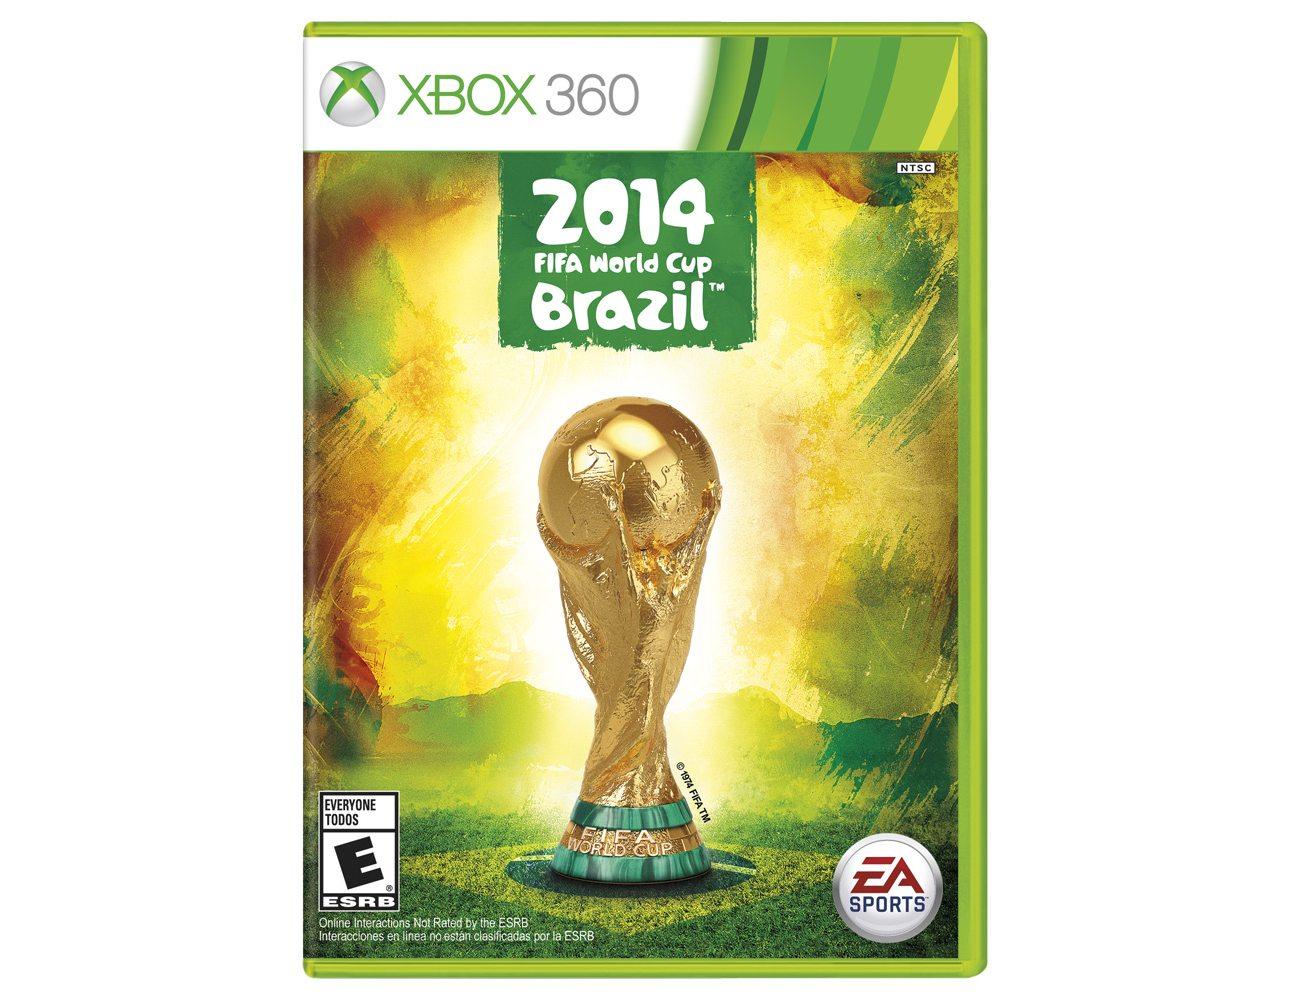 Xbox 360 2014 FIFA World Cup Brazil Xbox 360